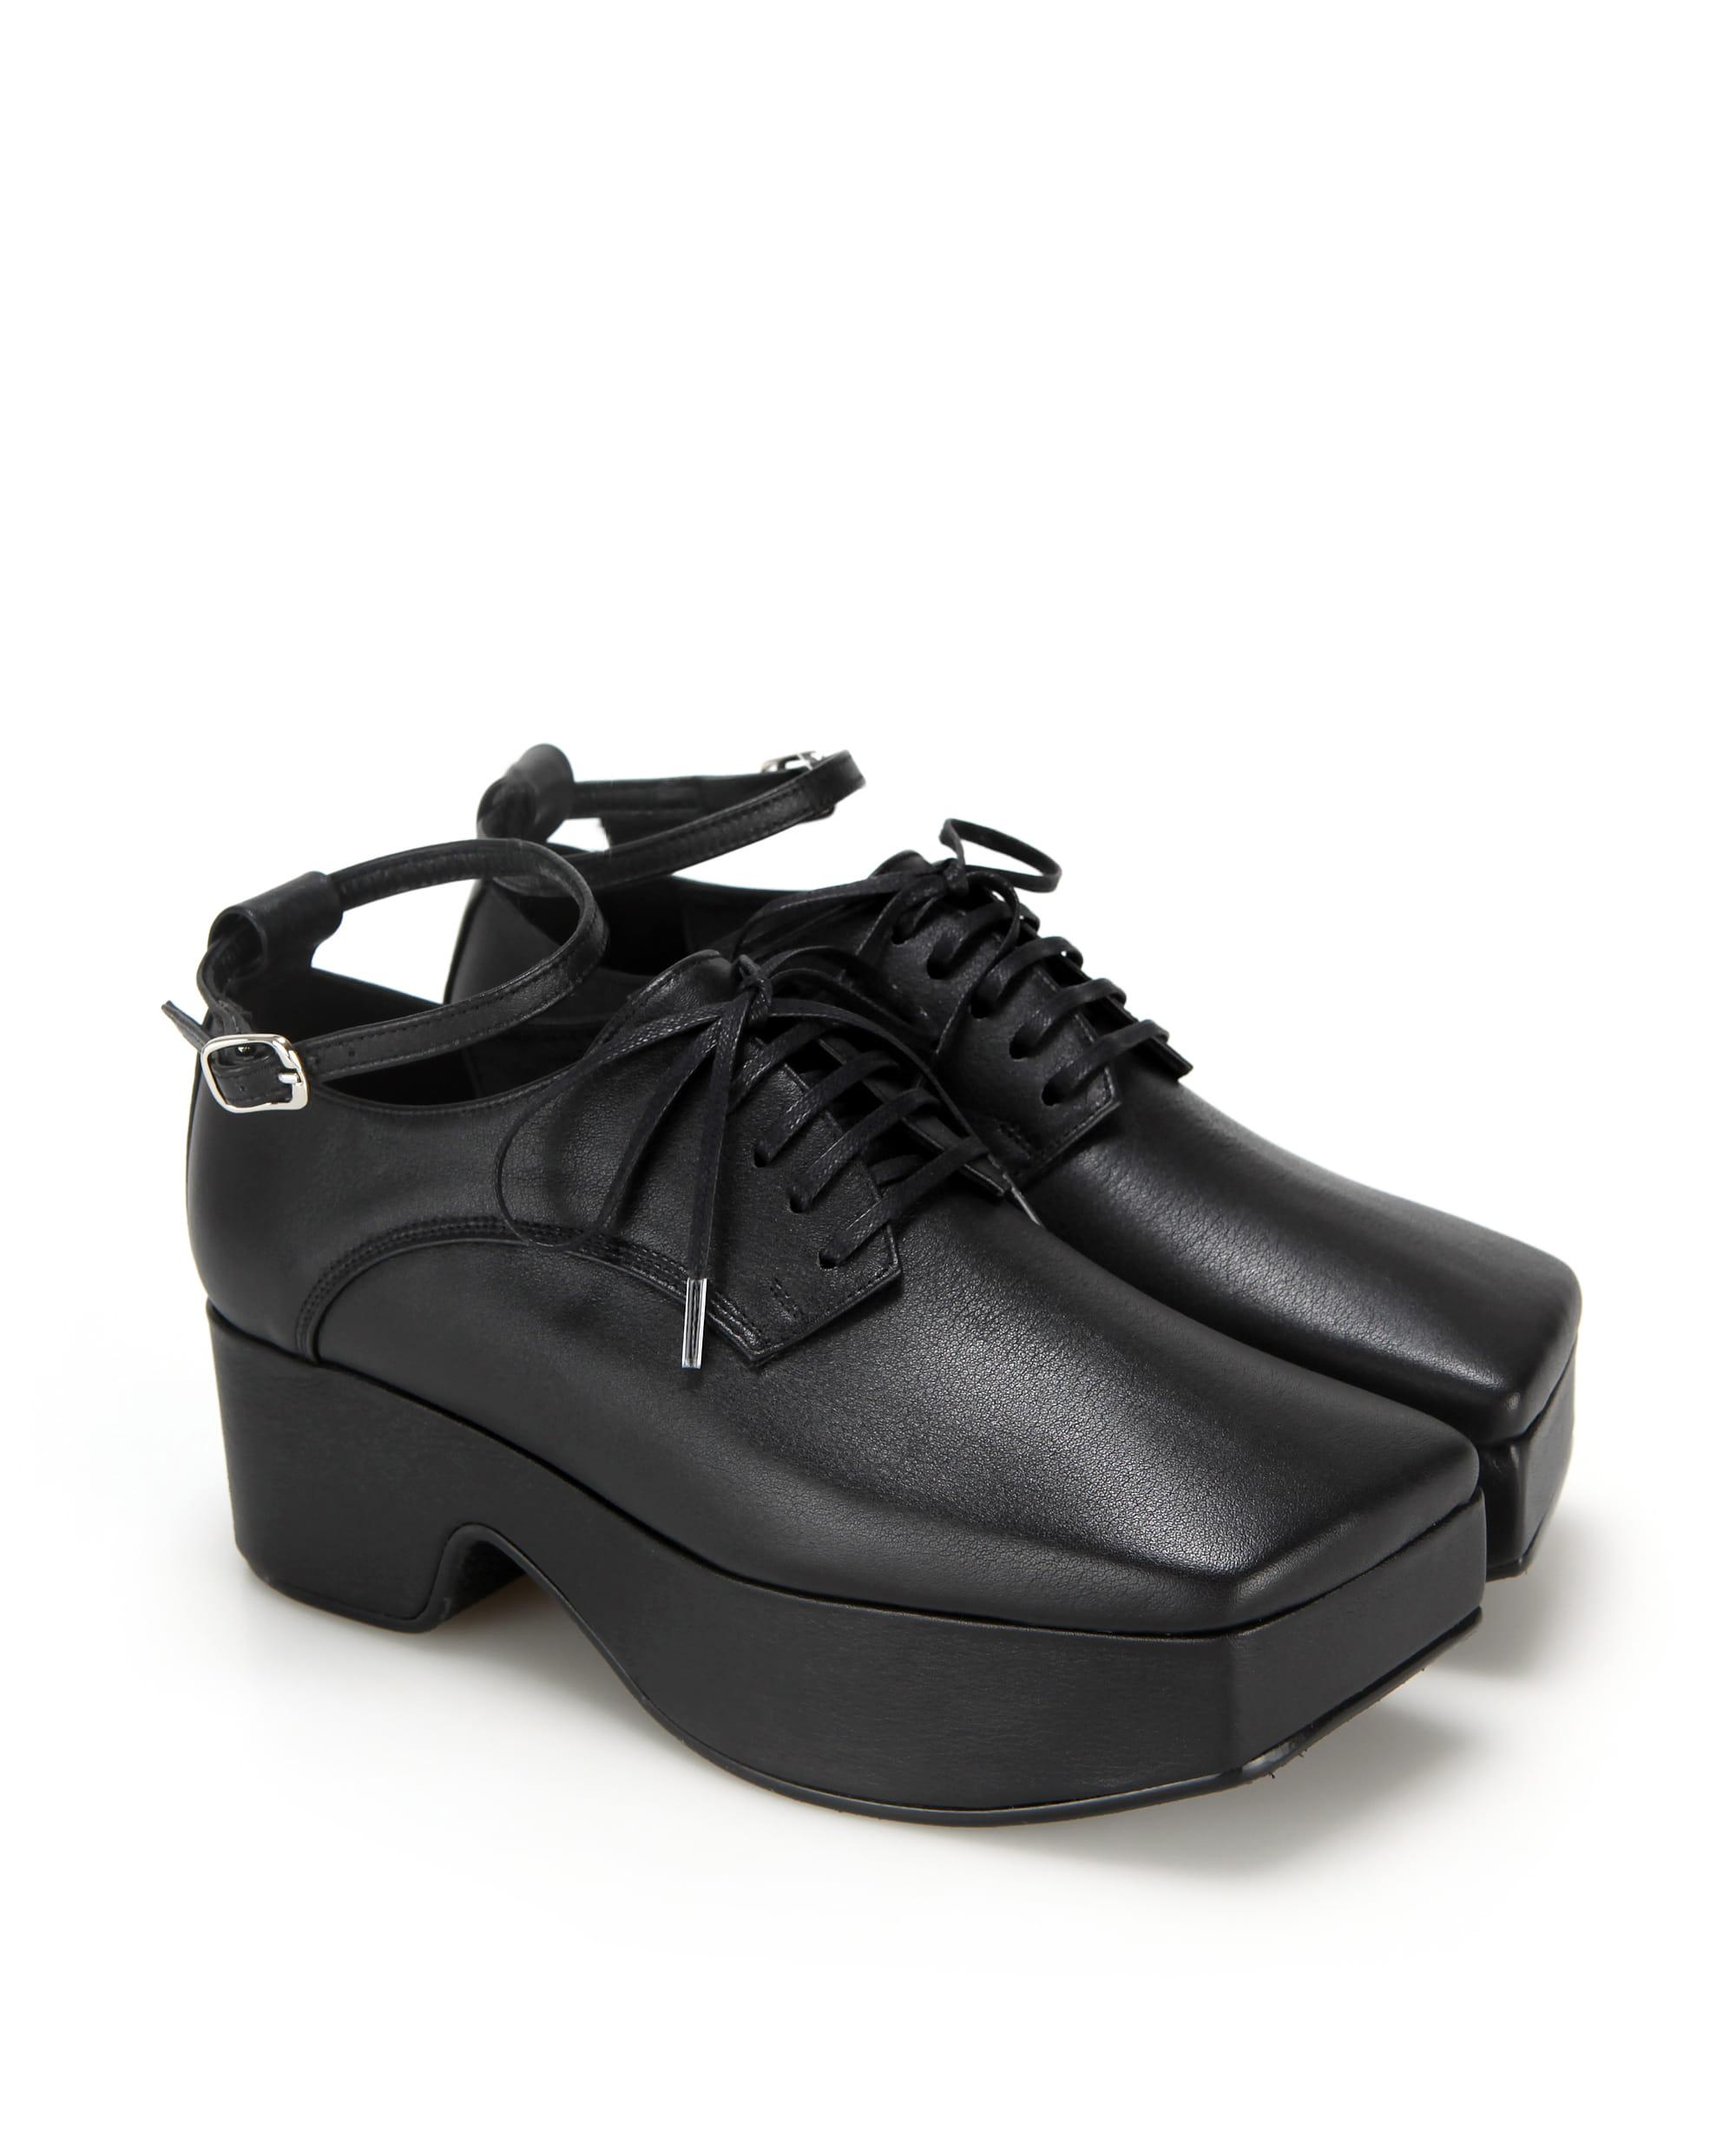 Squared toe derby platforms (+ball chain) | Black